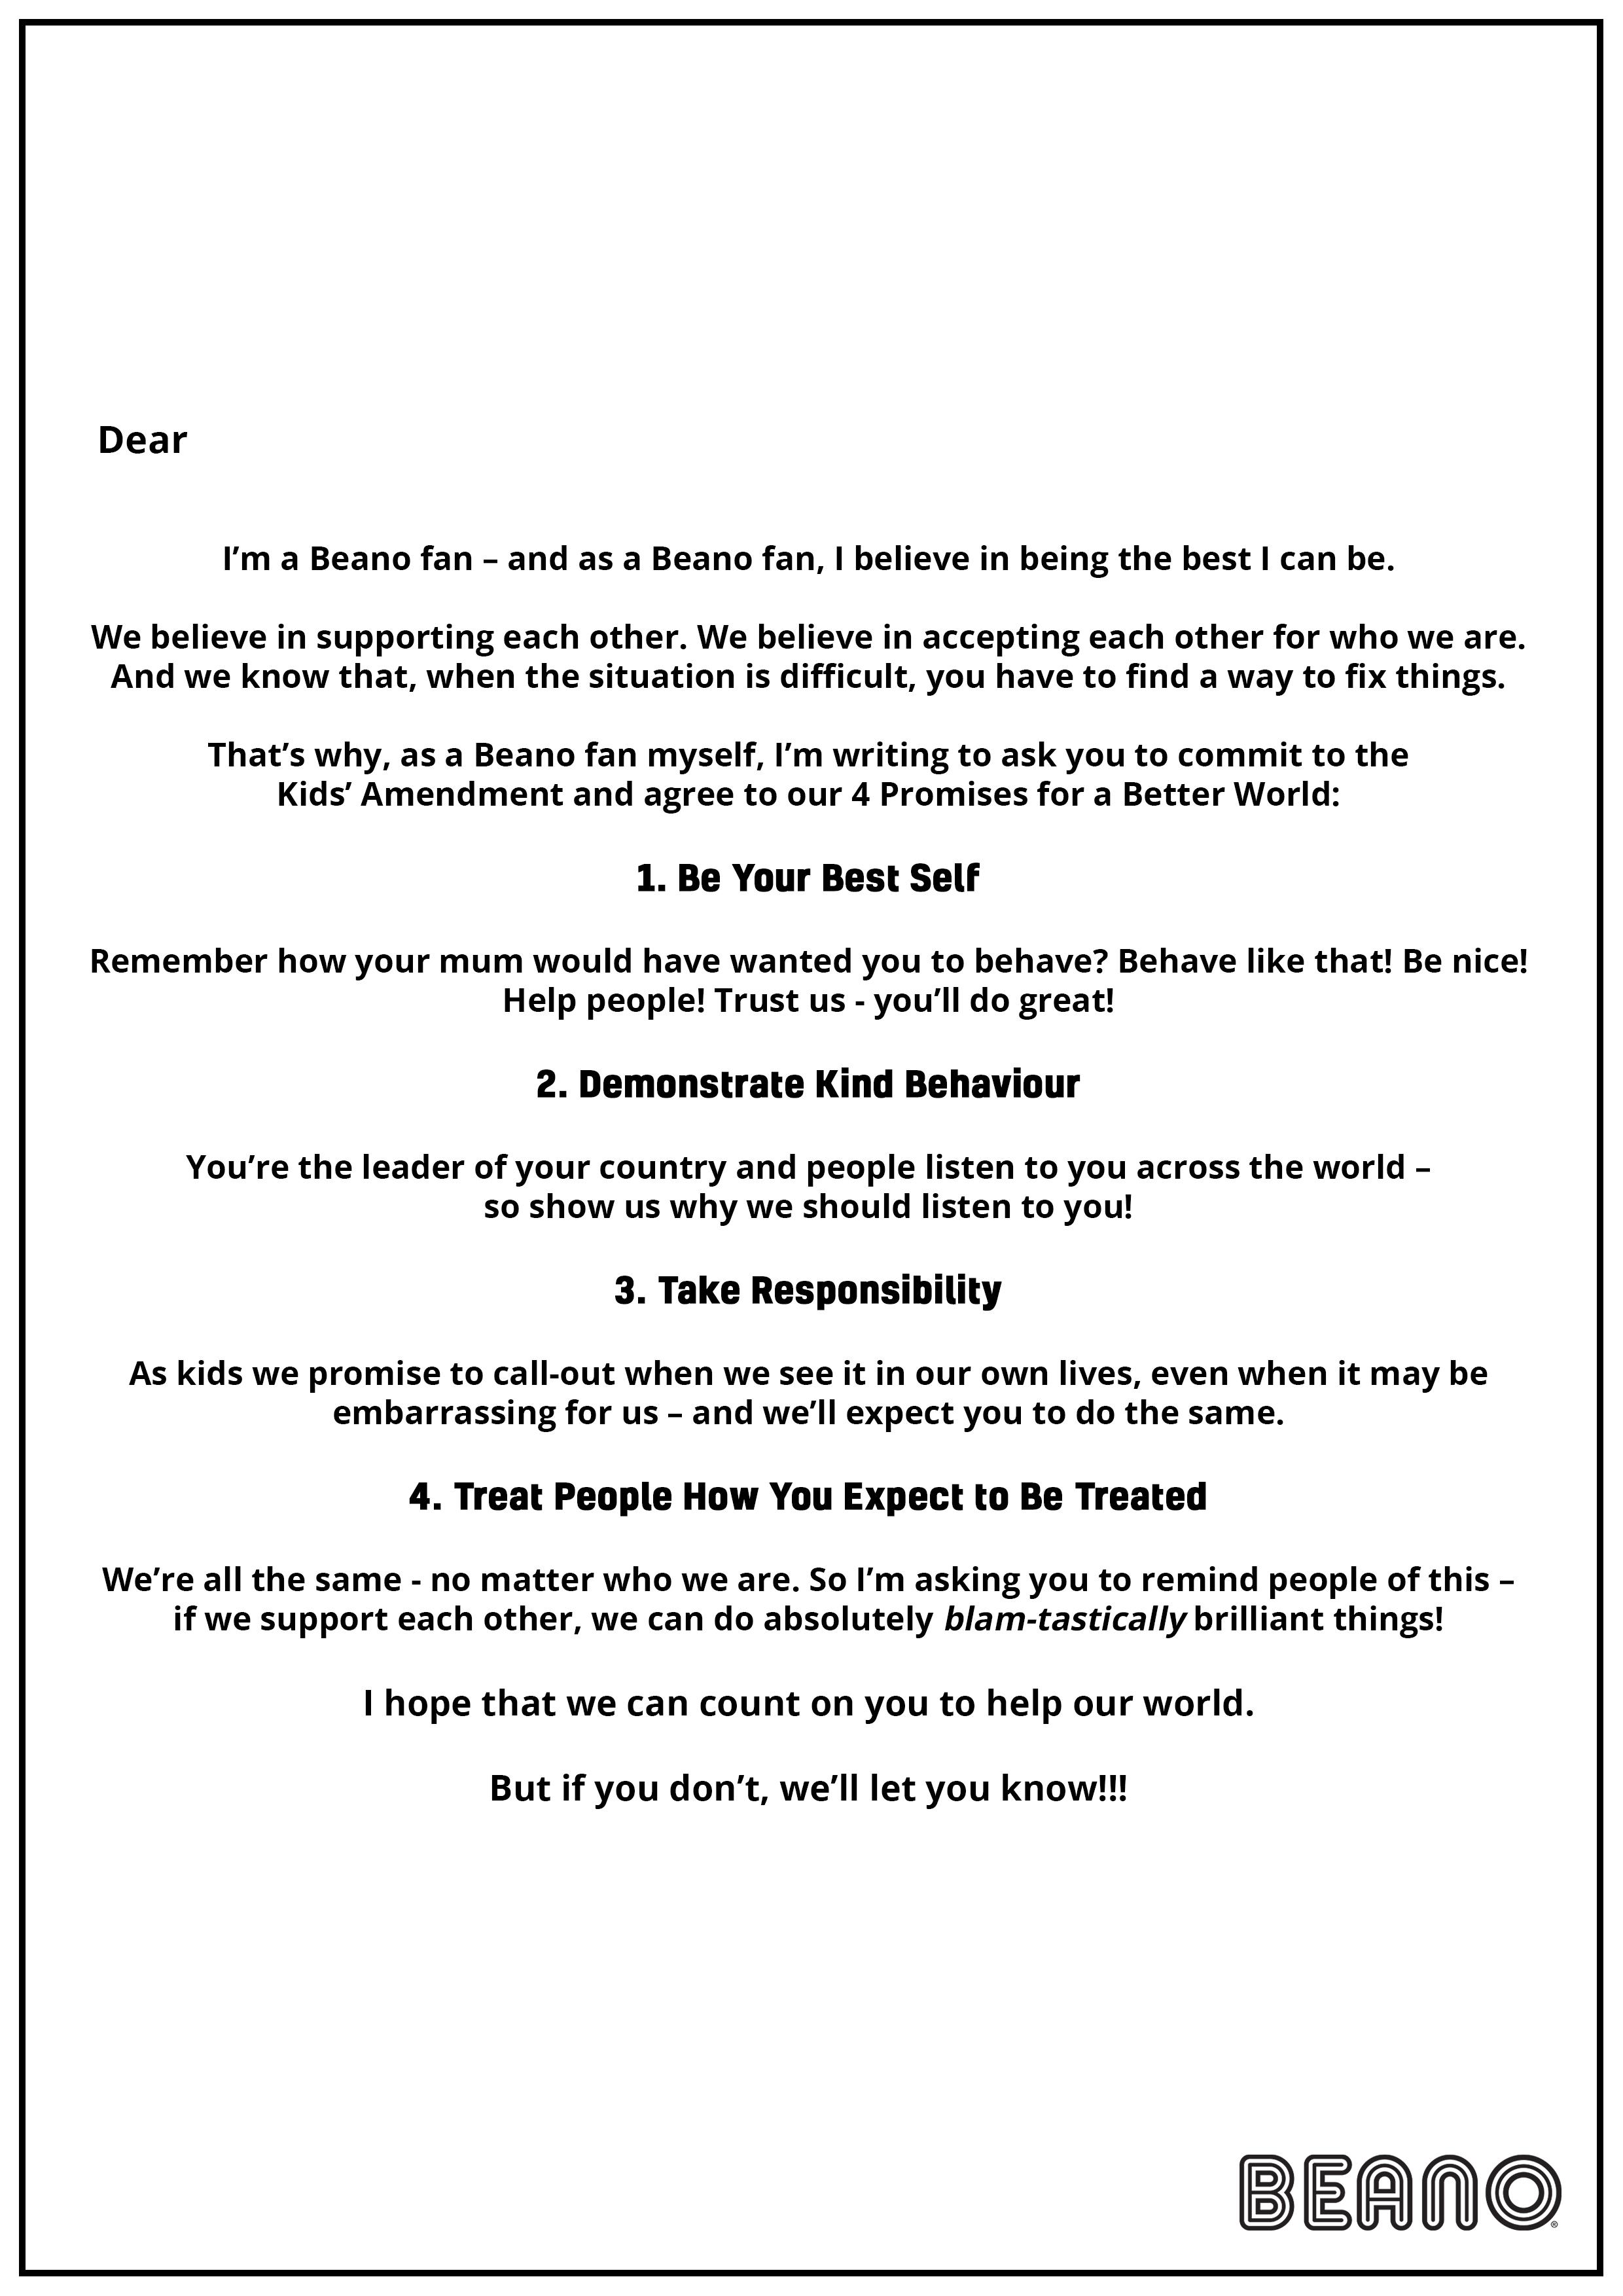 The Kids' Amendment - 4 Promises for a Better World